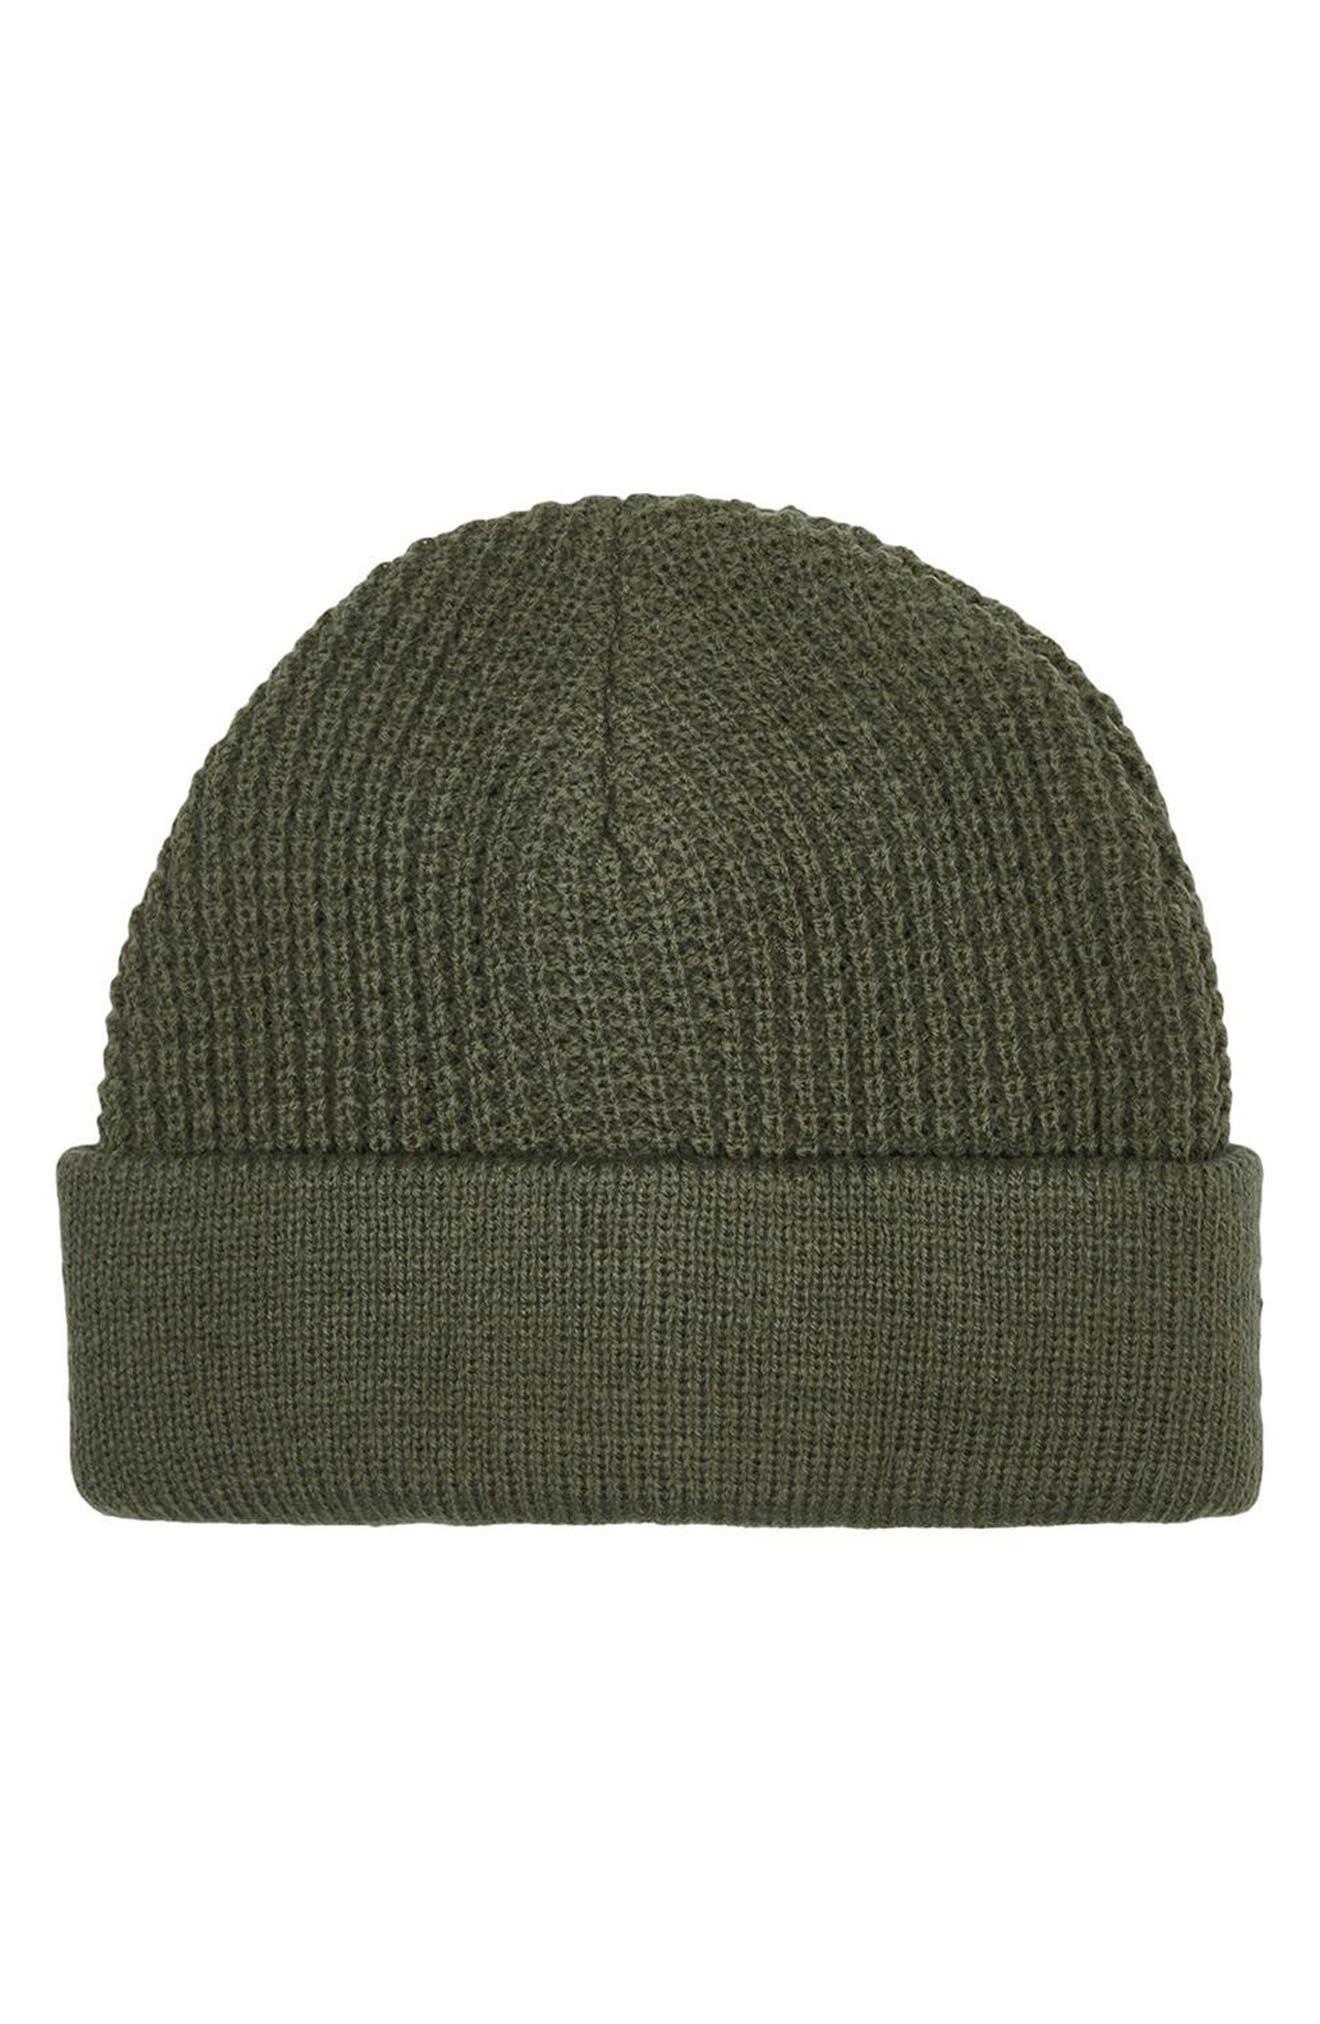 Knit Beanie,                         Main,                         color, 300